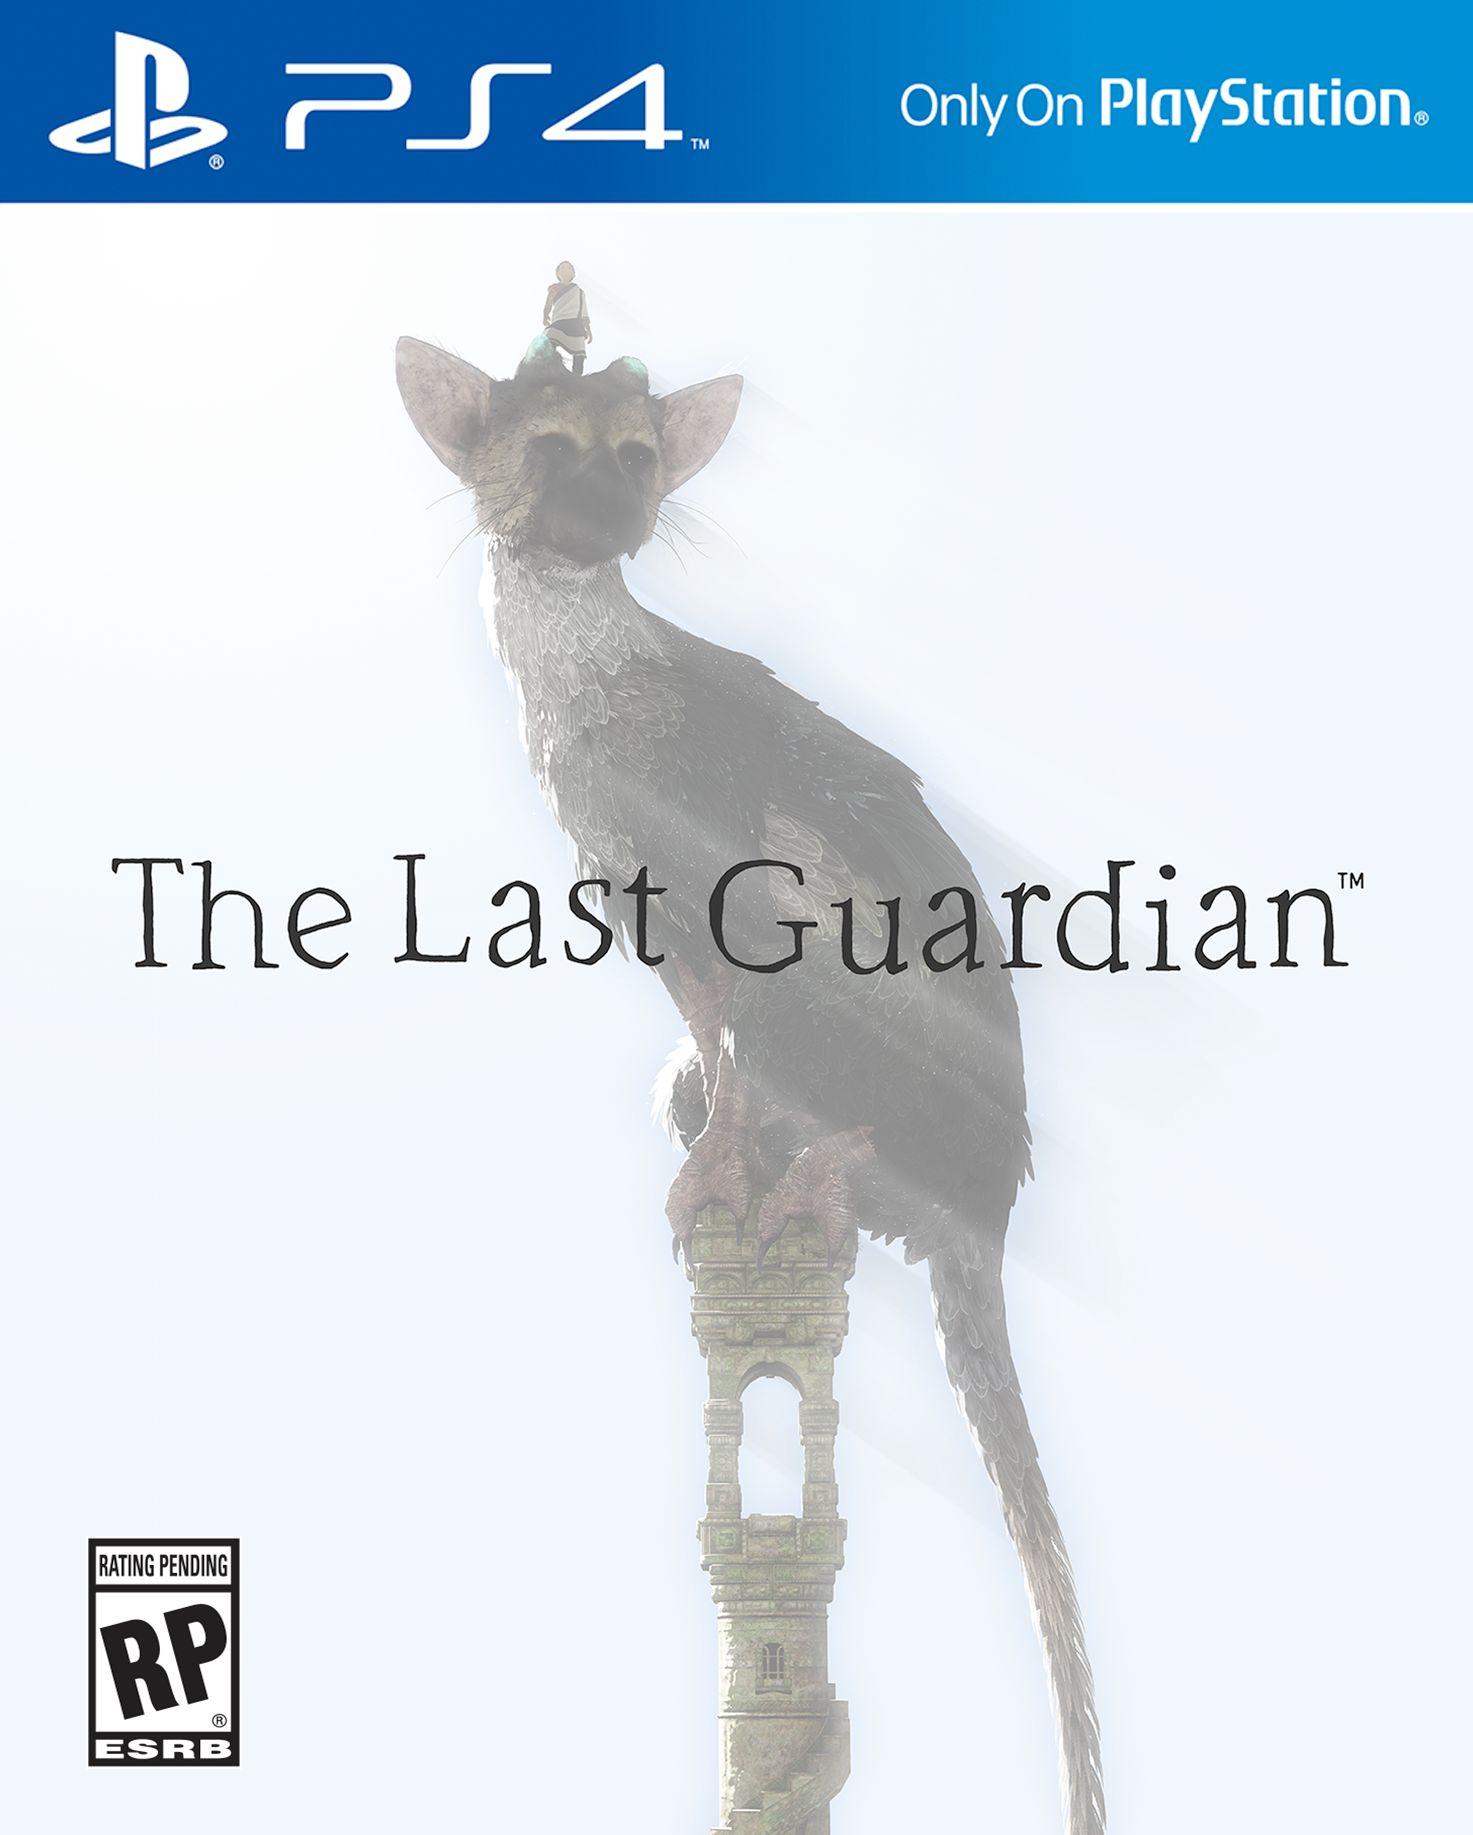 The Last Guardian - Fumito Ueda